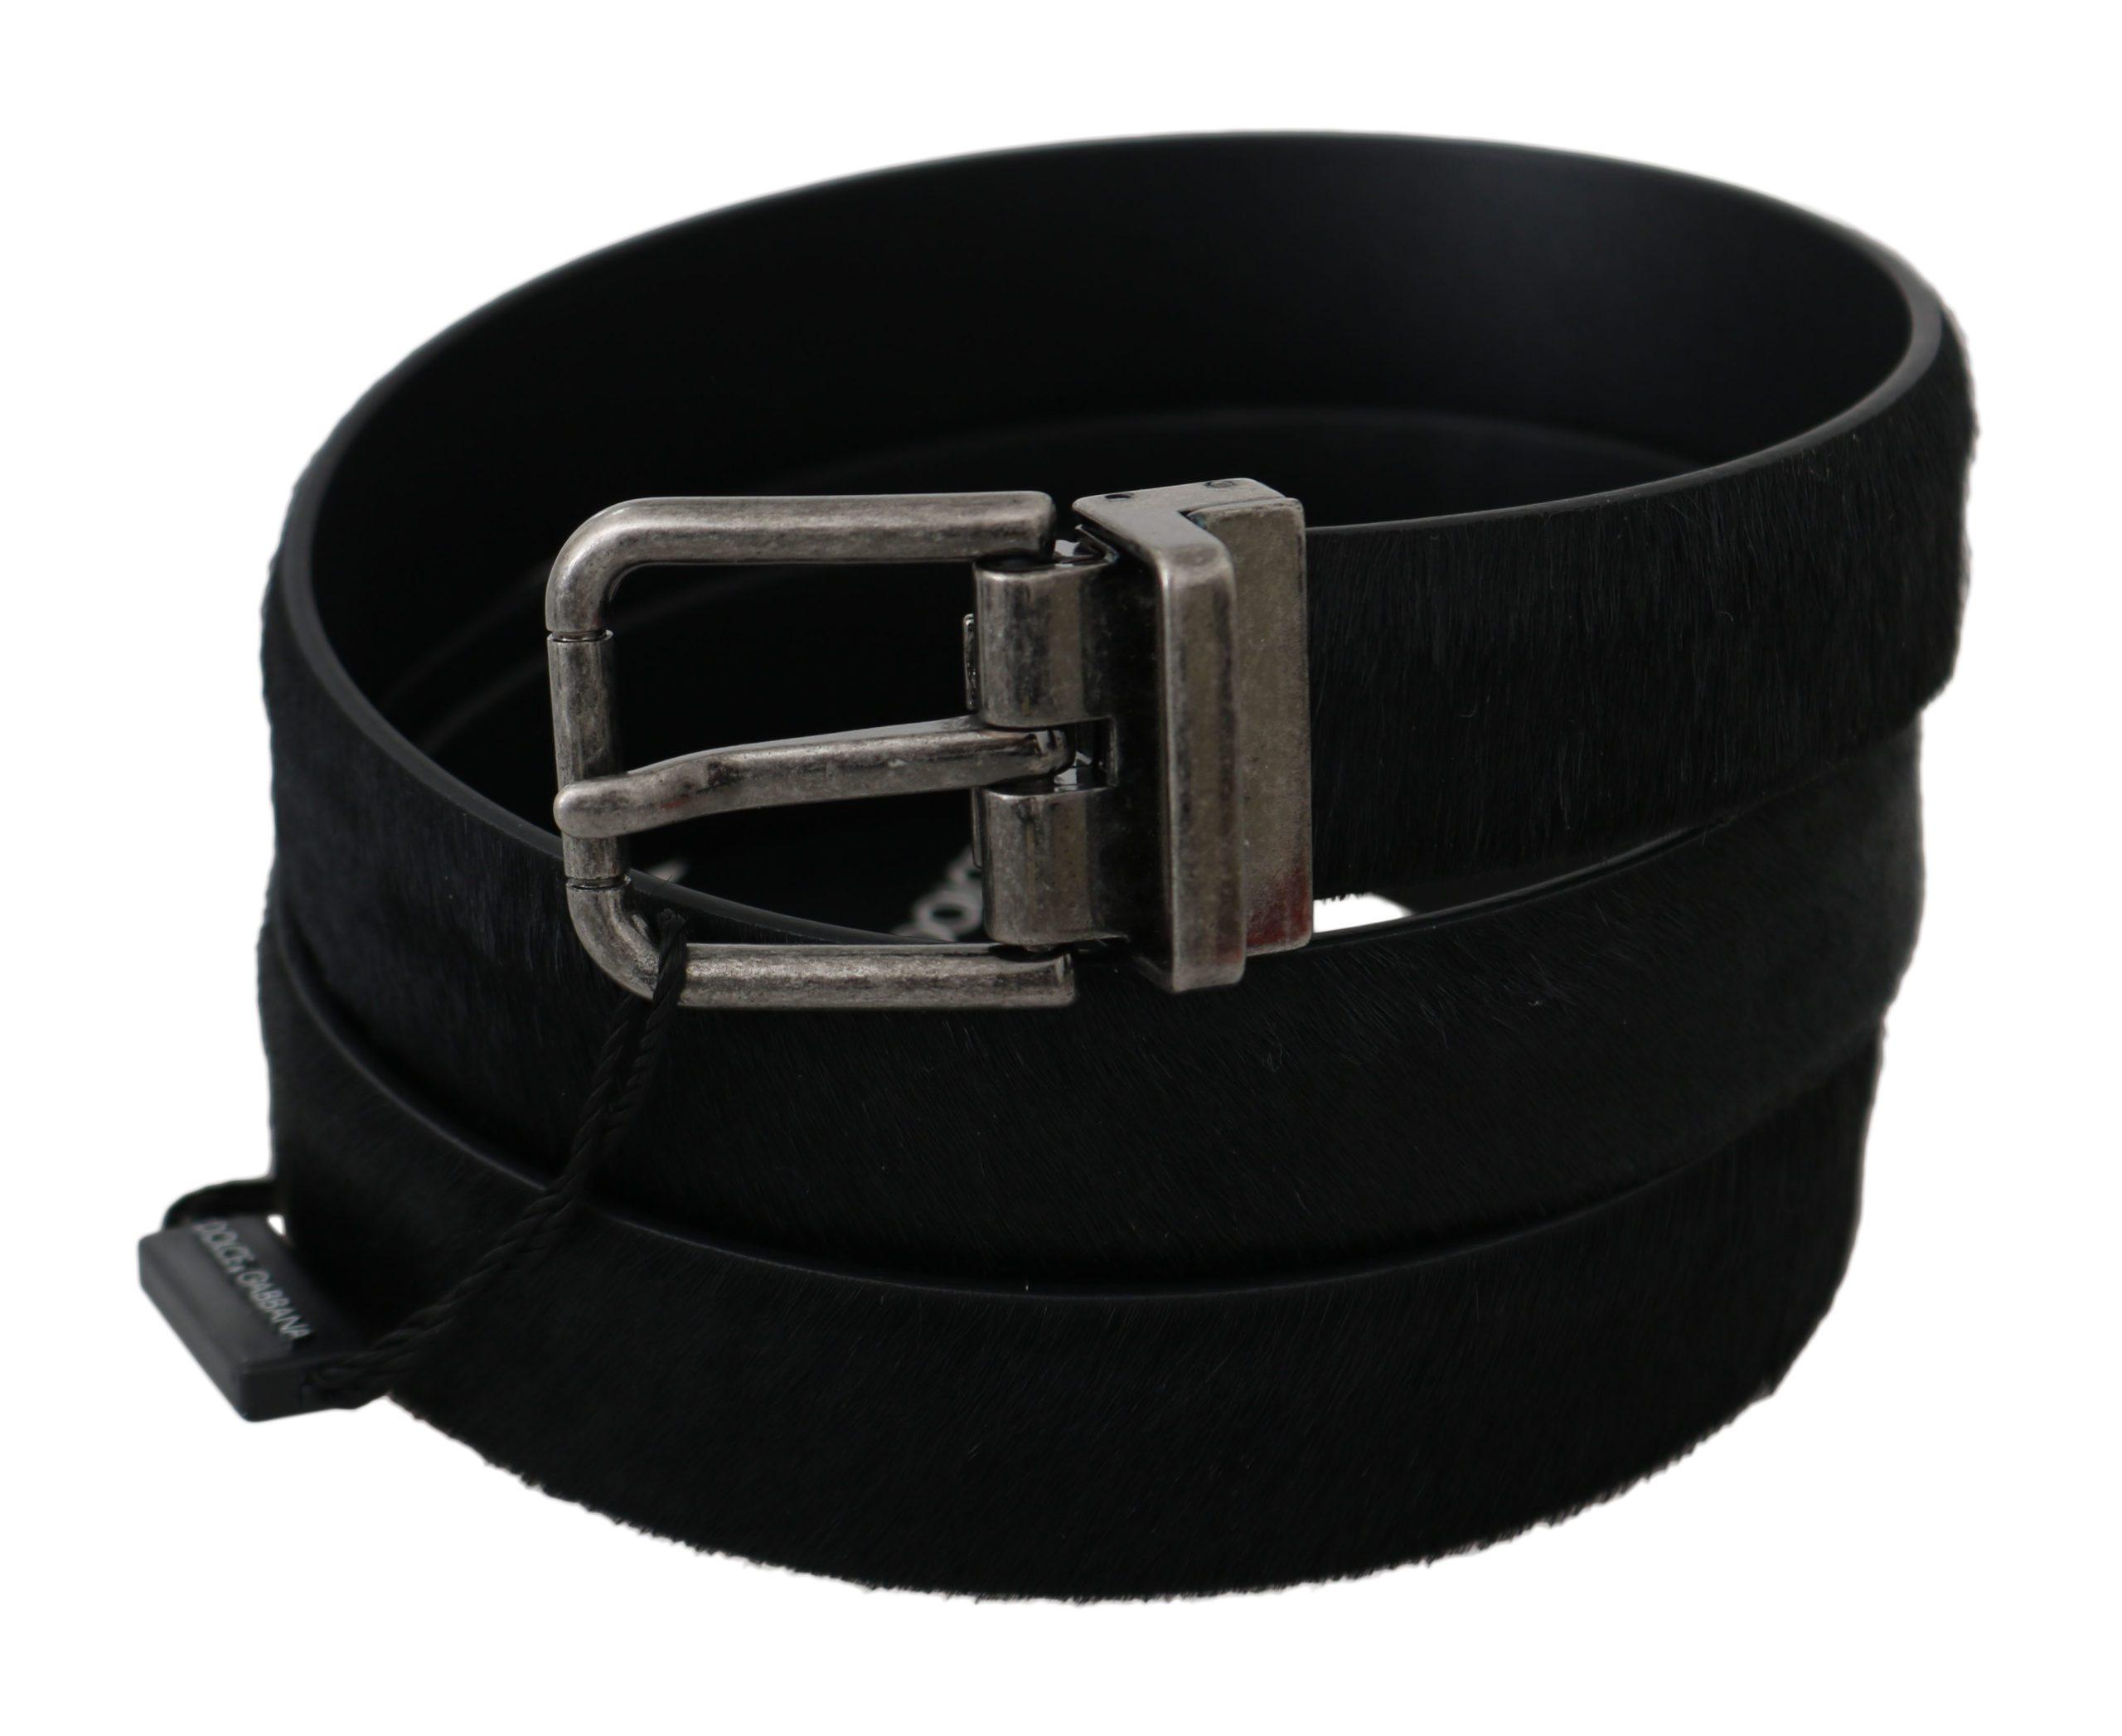 Dolce & Gabbana Men's Fur Leather Metal Buckle Belt Green BEL60330 - 110 cm / 44 Inches